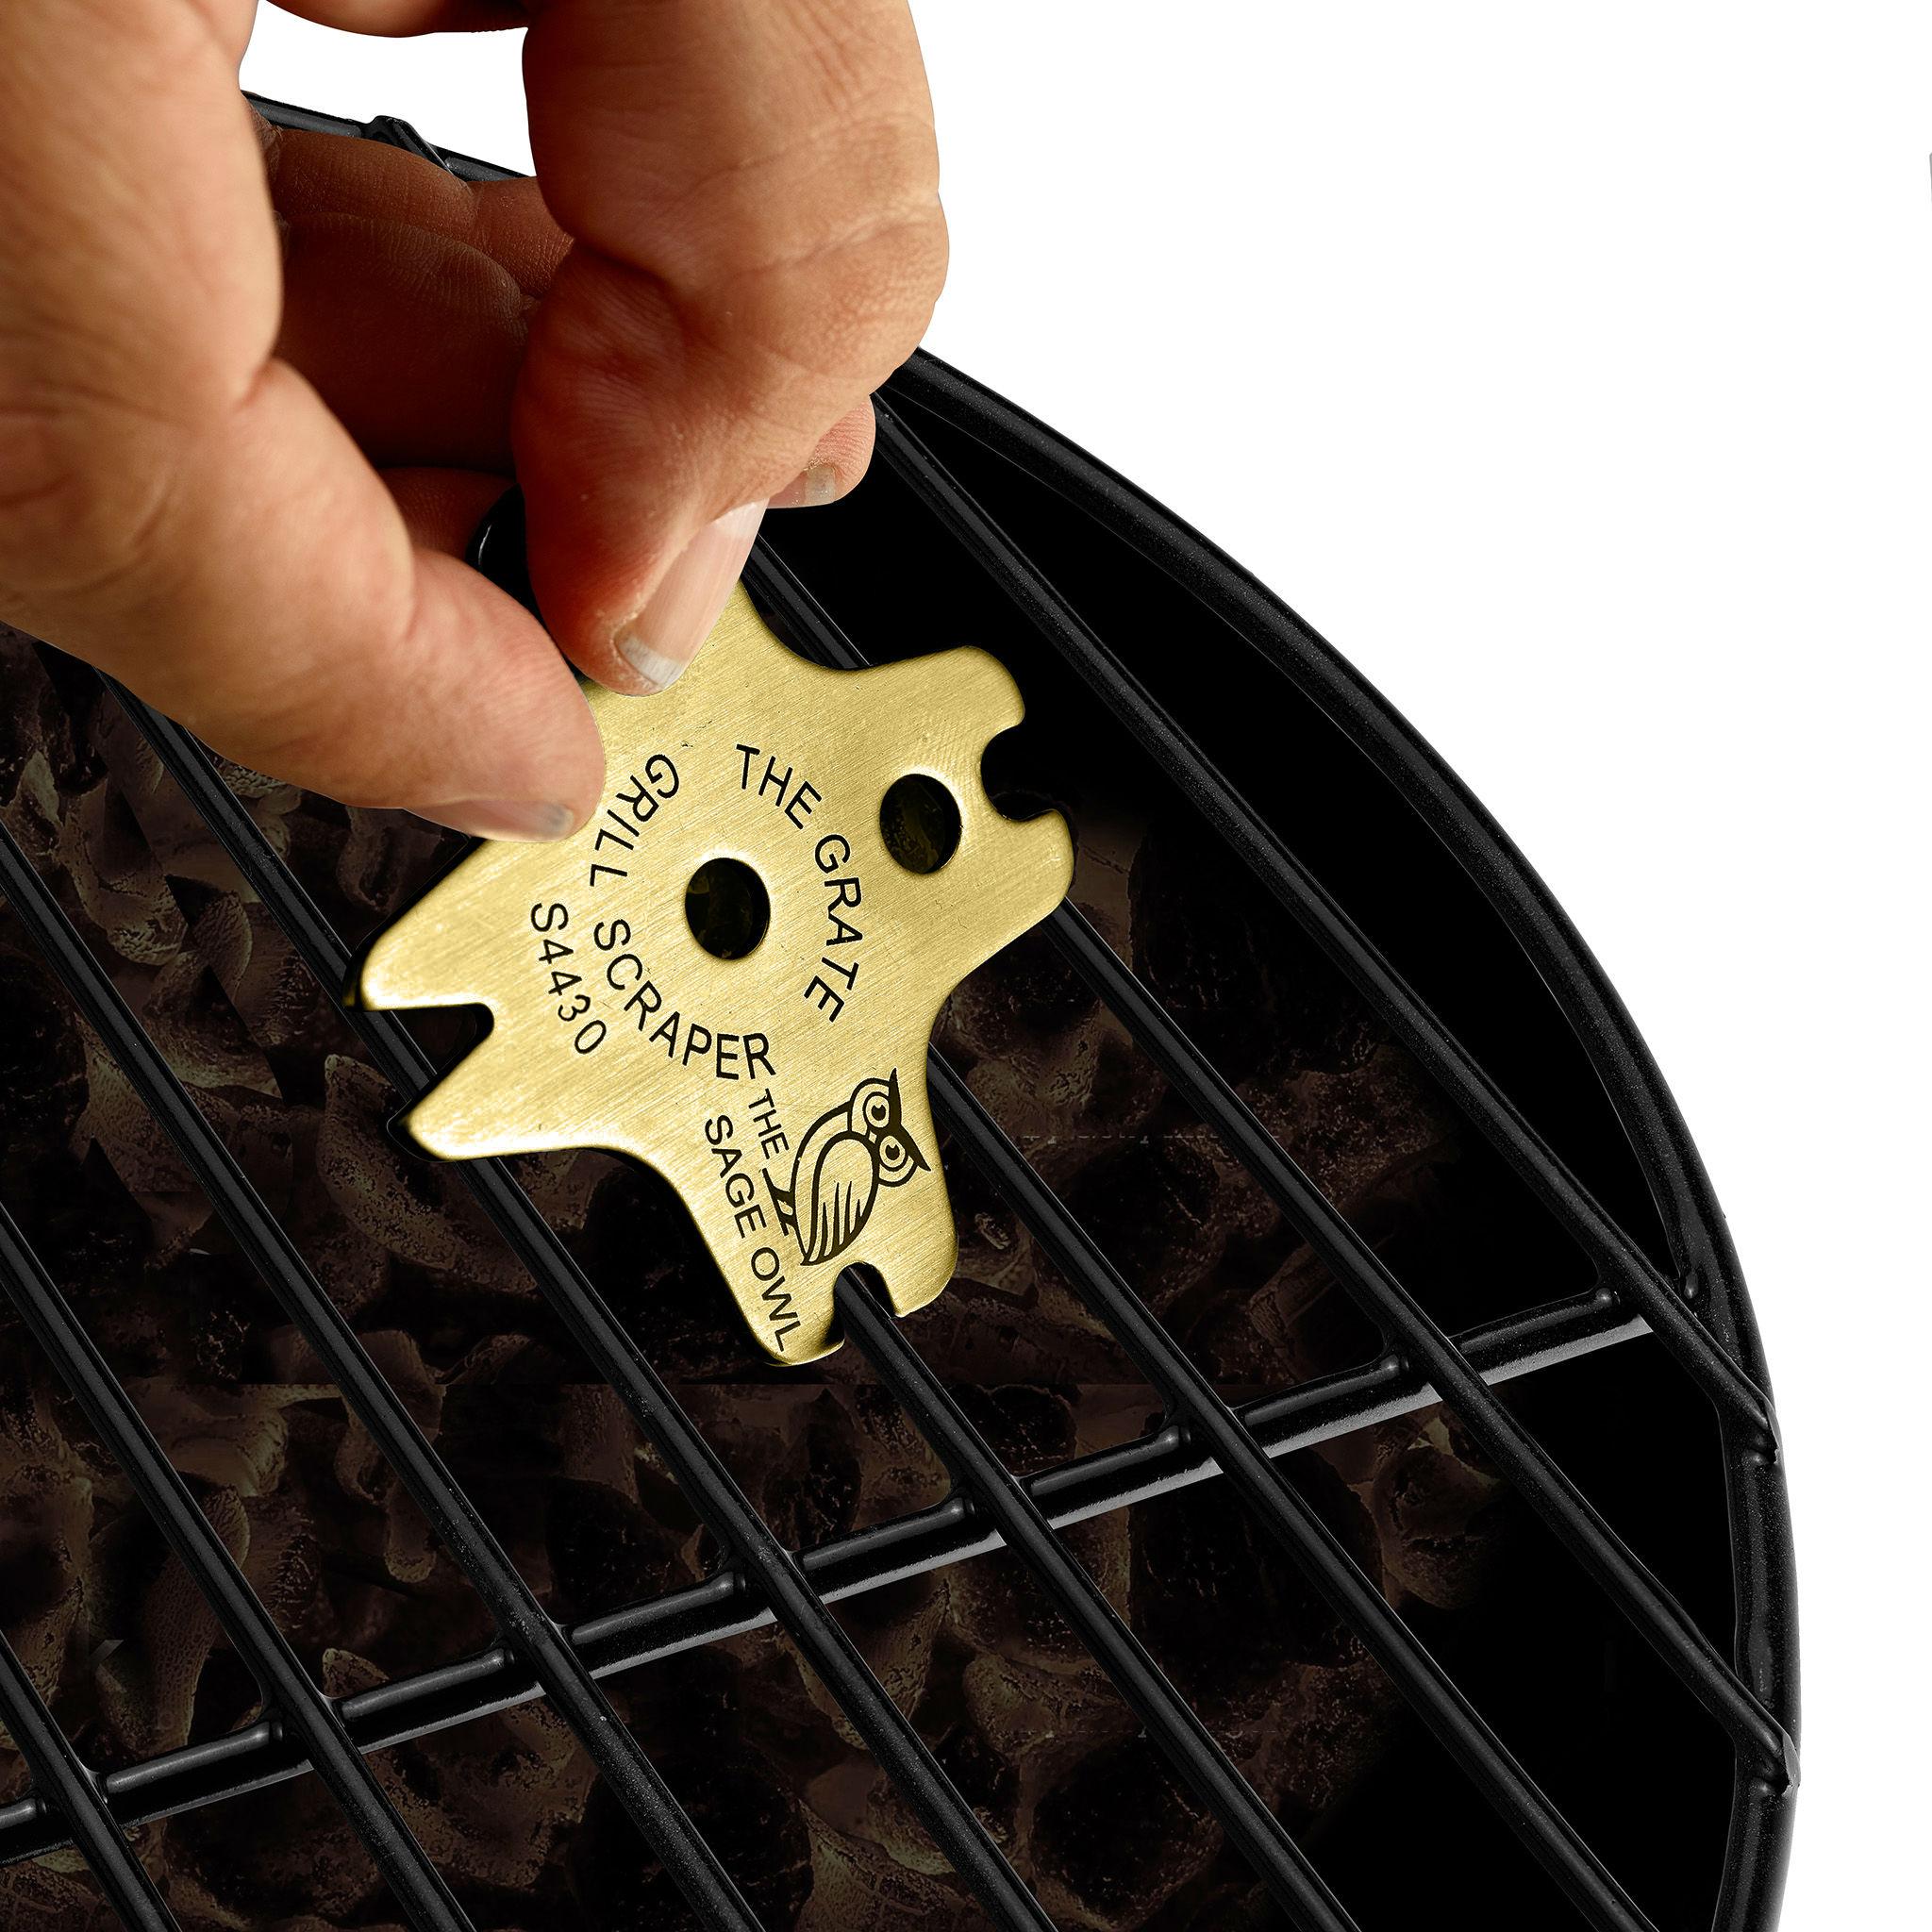 S4430 - The Grate Grill Scraper - Brass Barbque Grill Cleaner